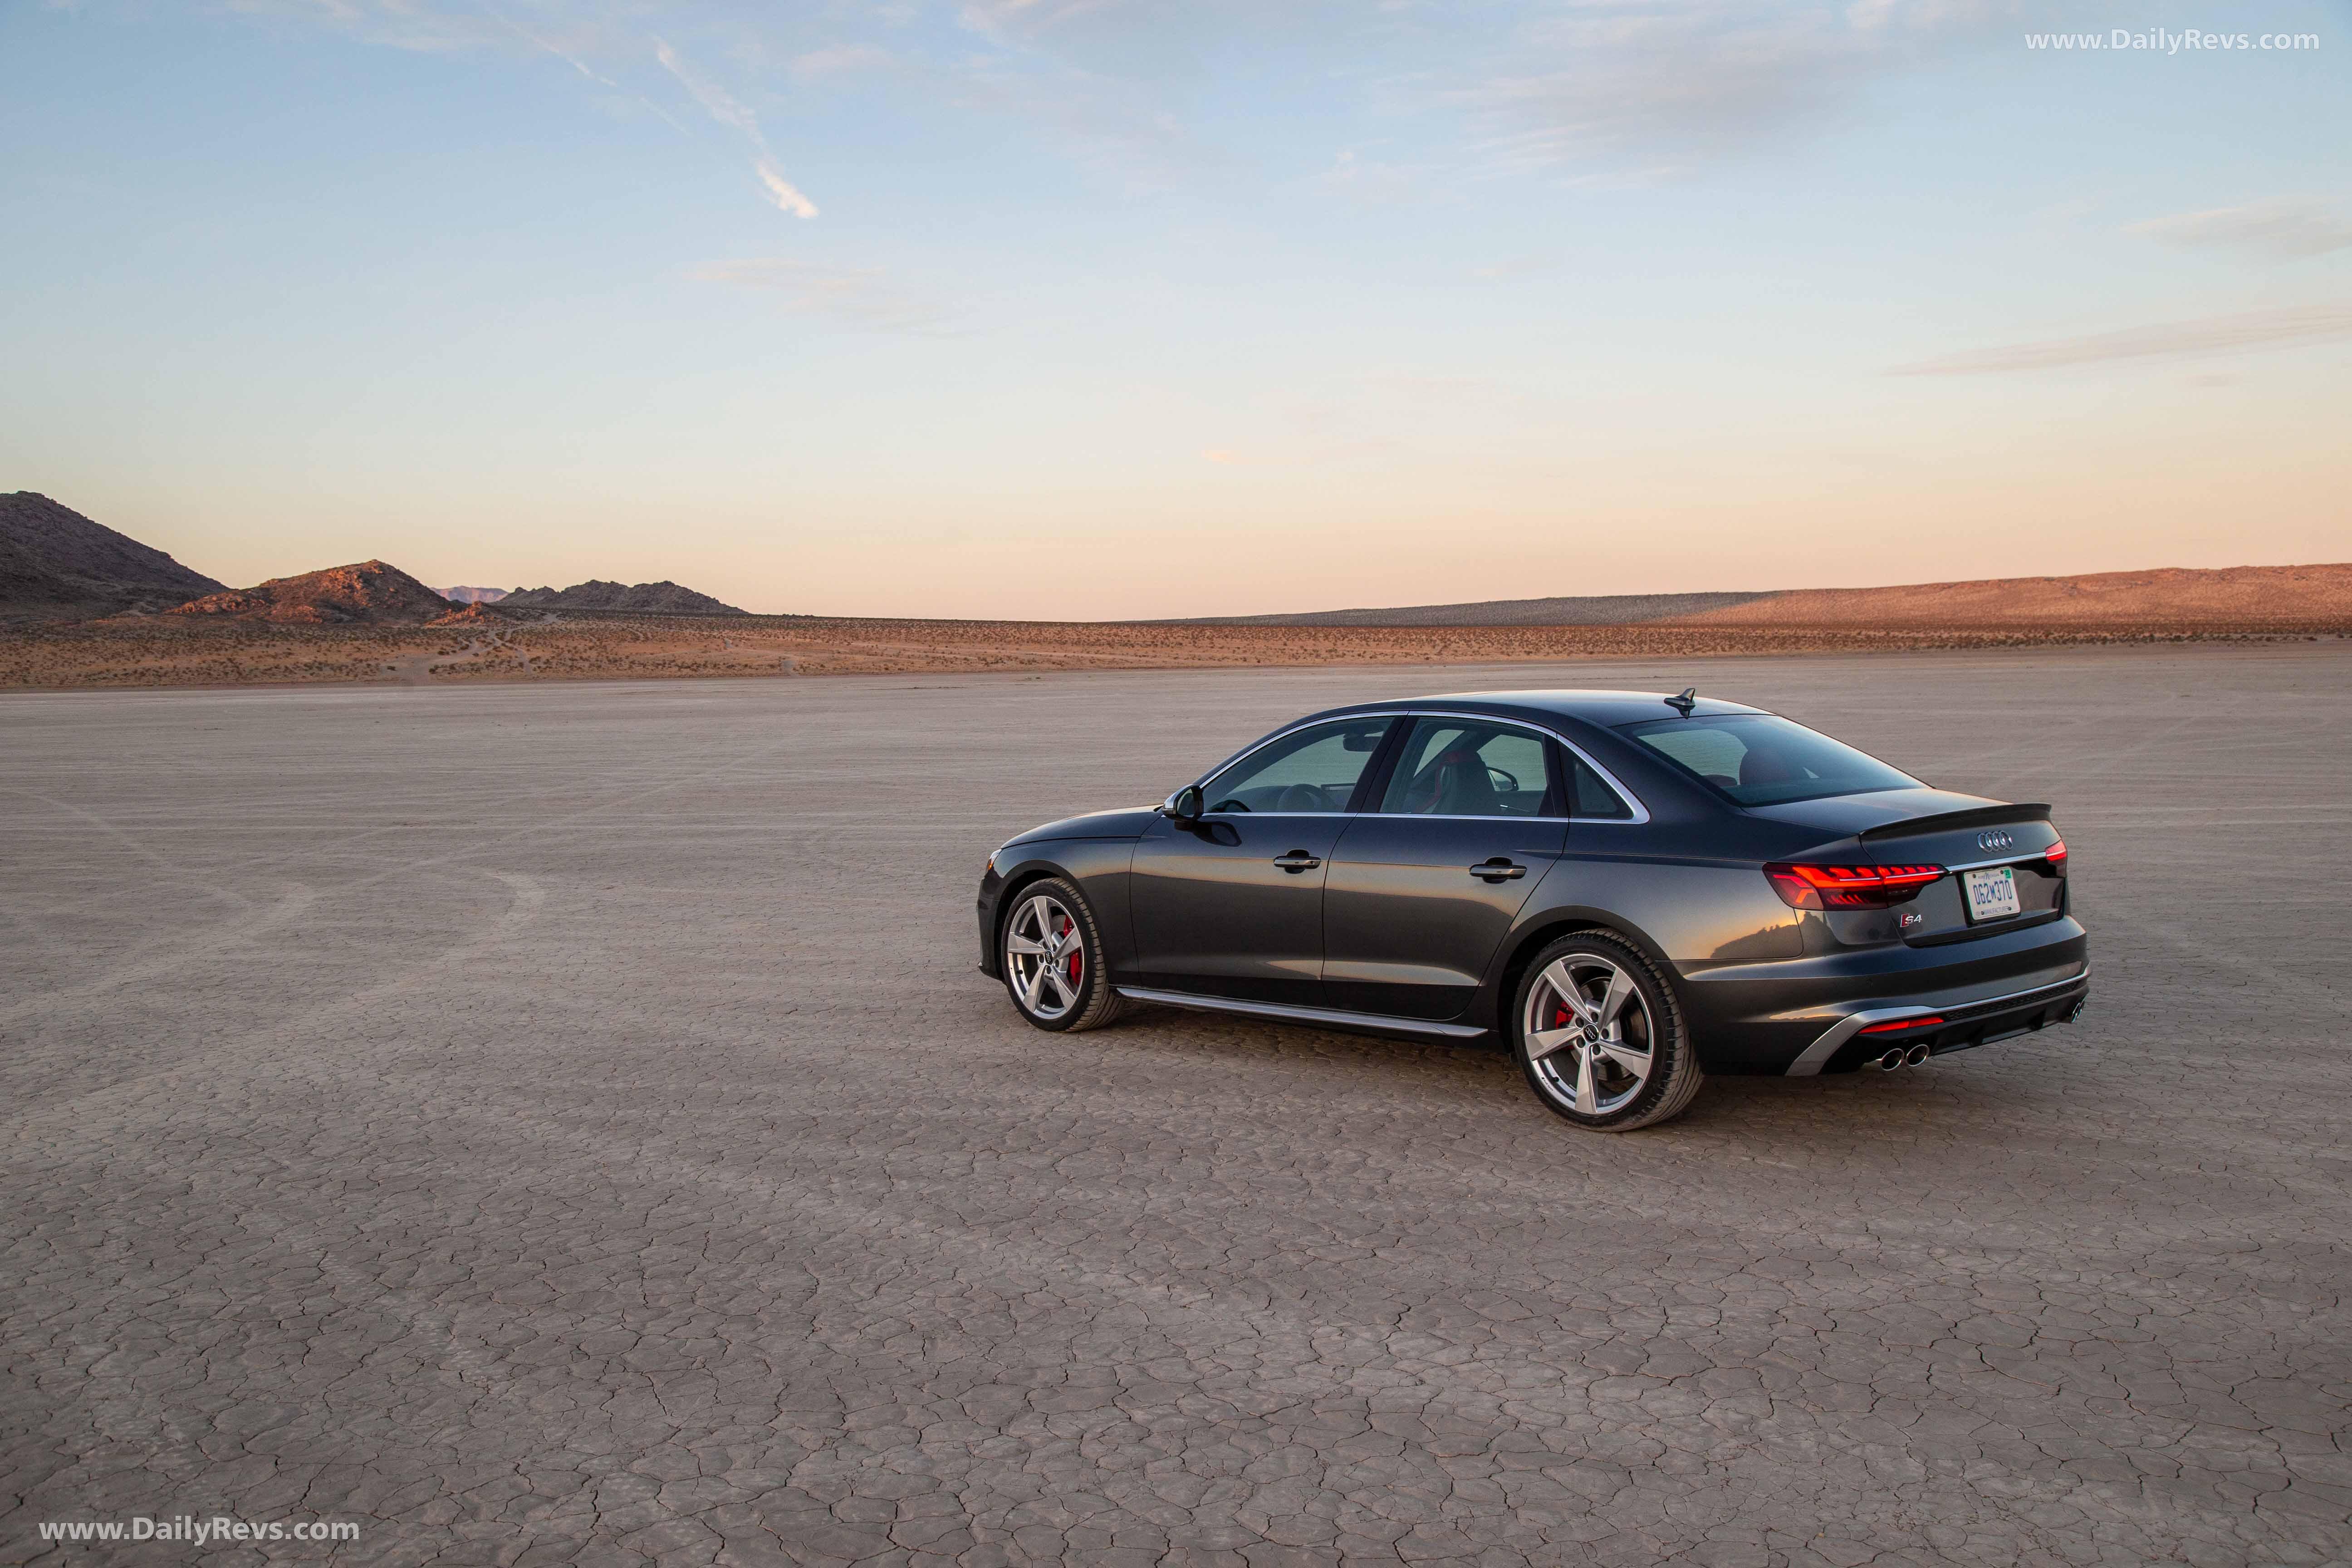 2020 Audi S4 US - HD Pictures, Videos, Specs ...